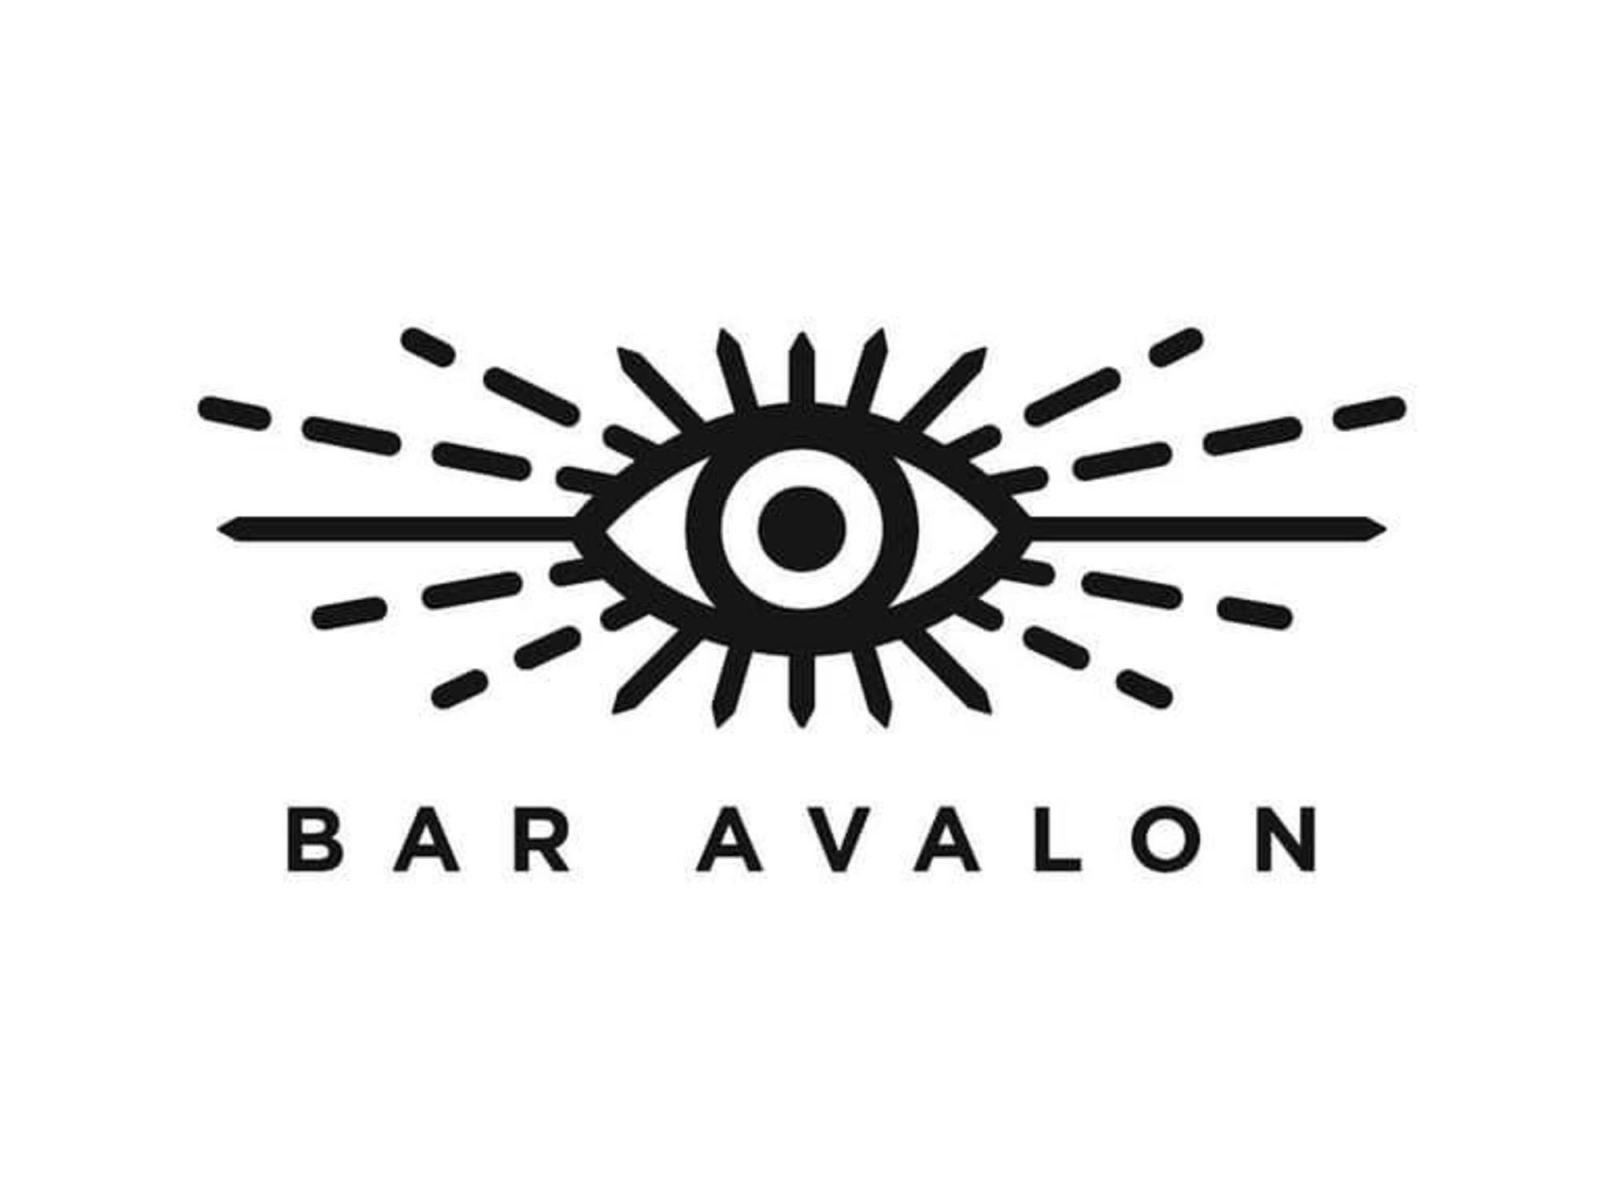 Bar Avalon from Revelator Coffee